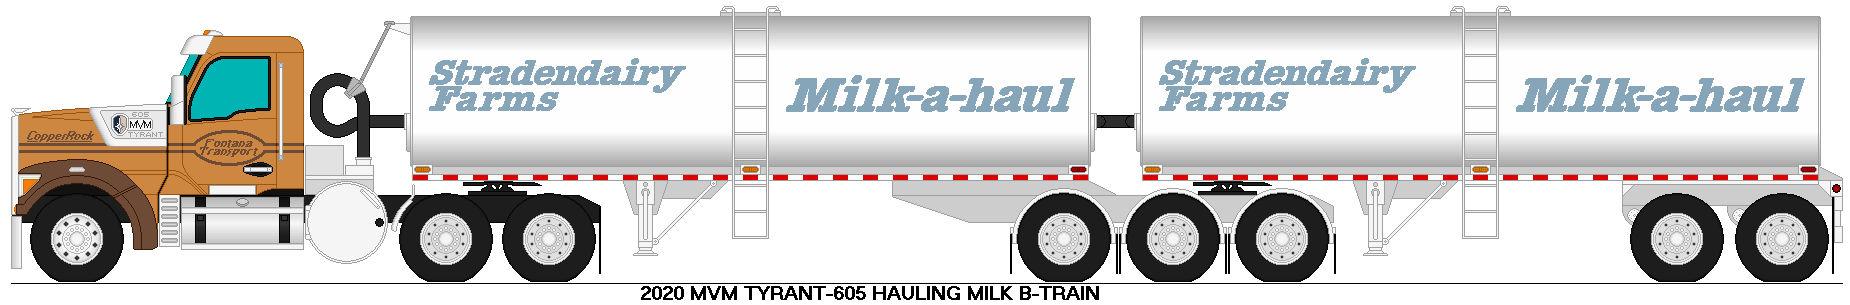 MVM Tyrant 605 milk b-train